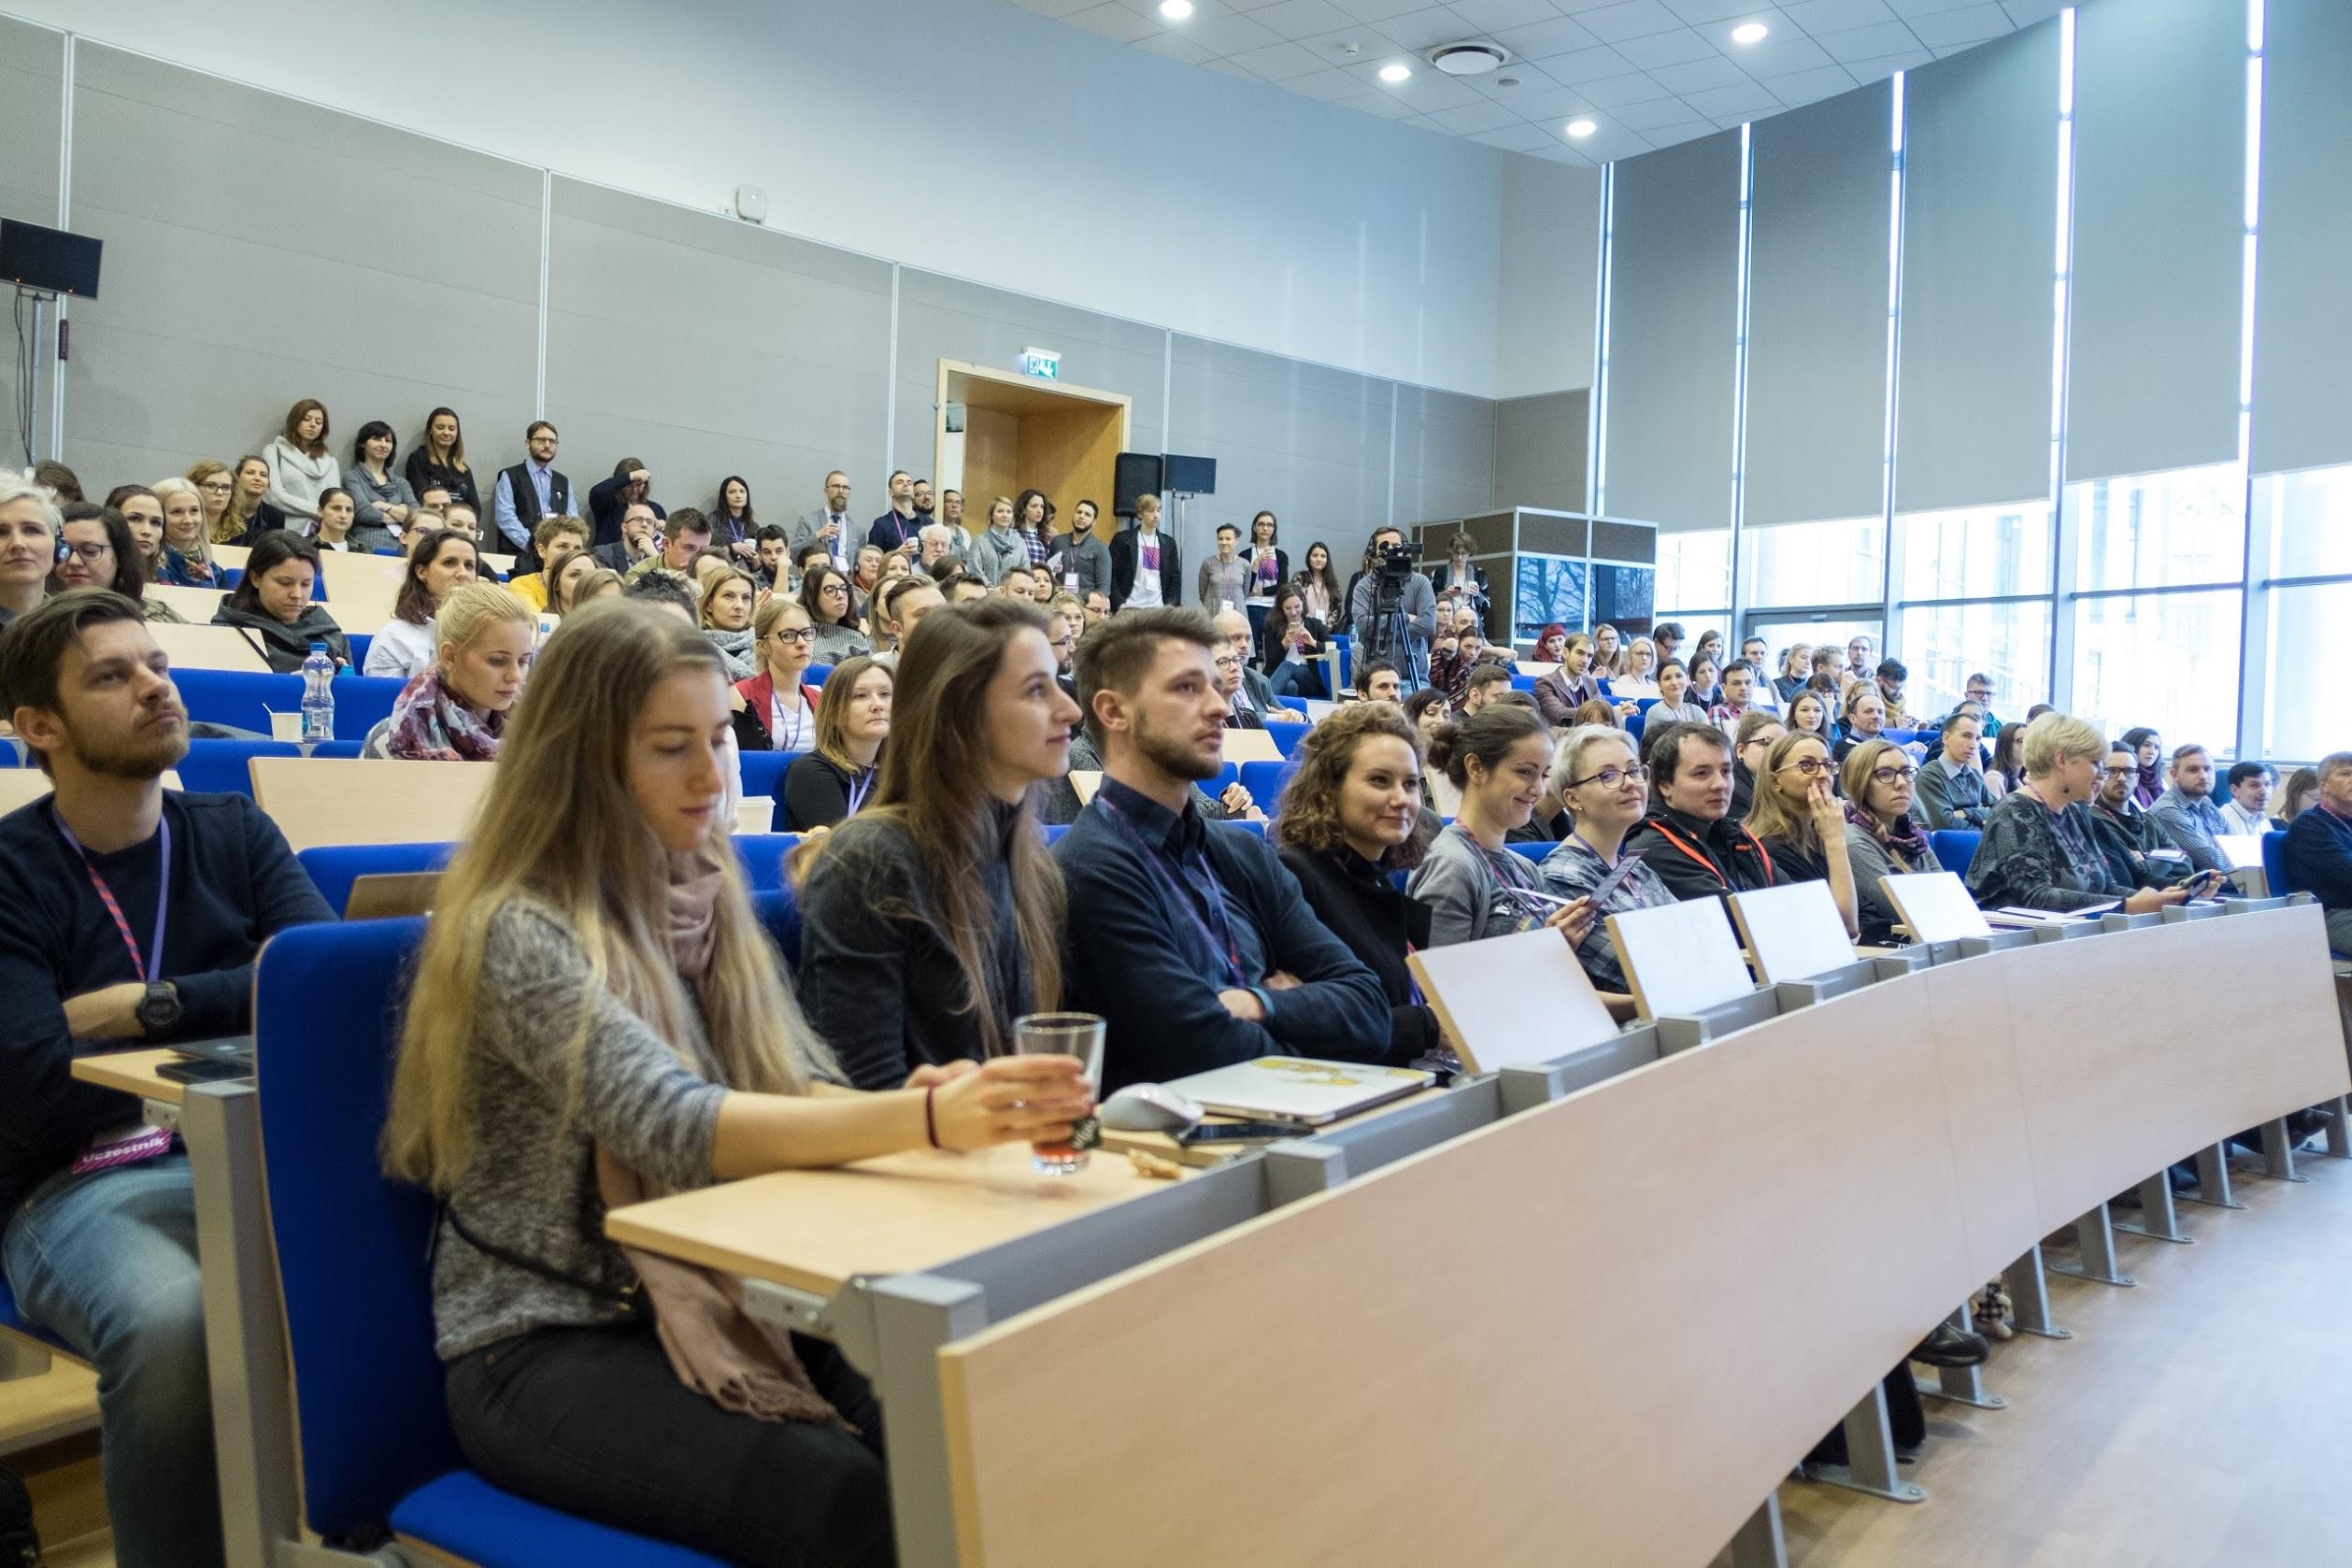 Aula - Uczestnicy konferencji